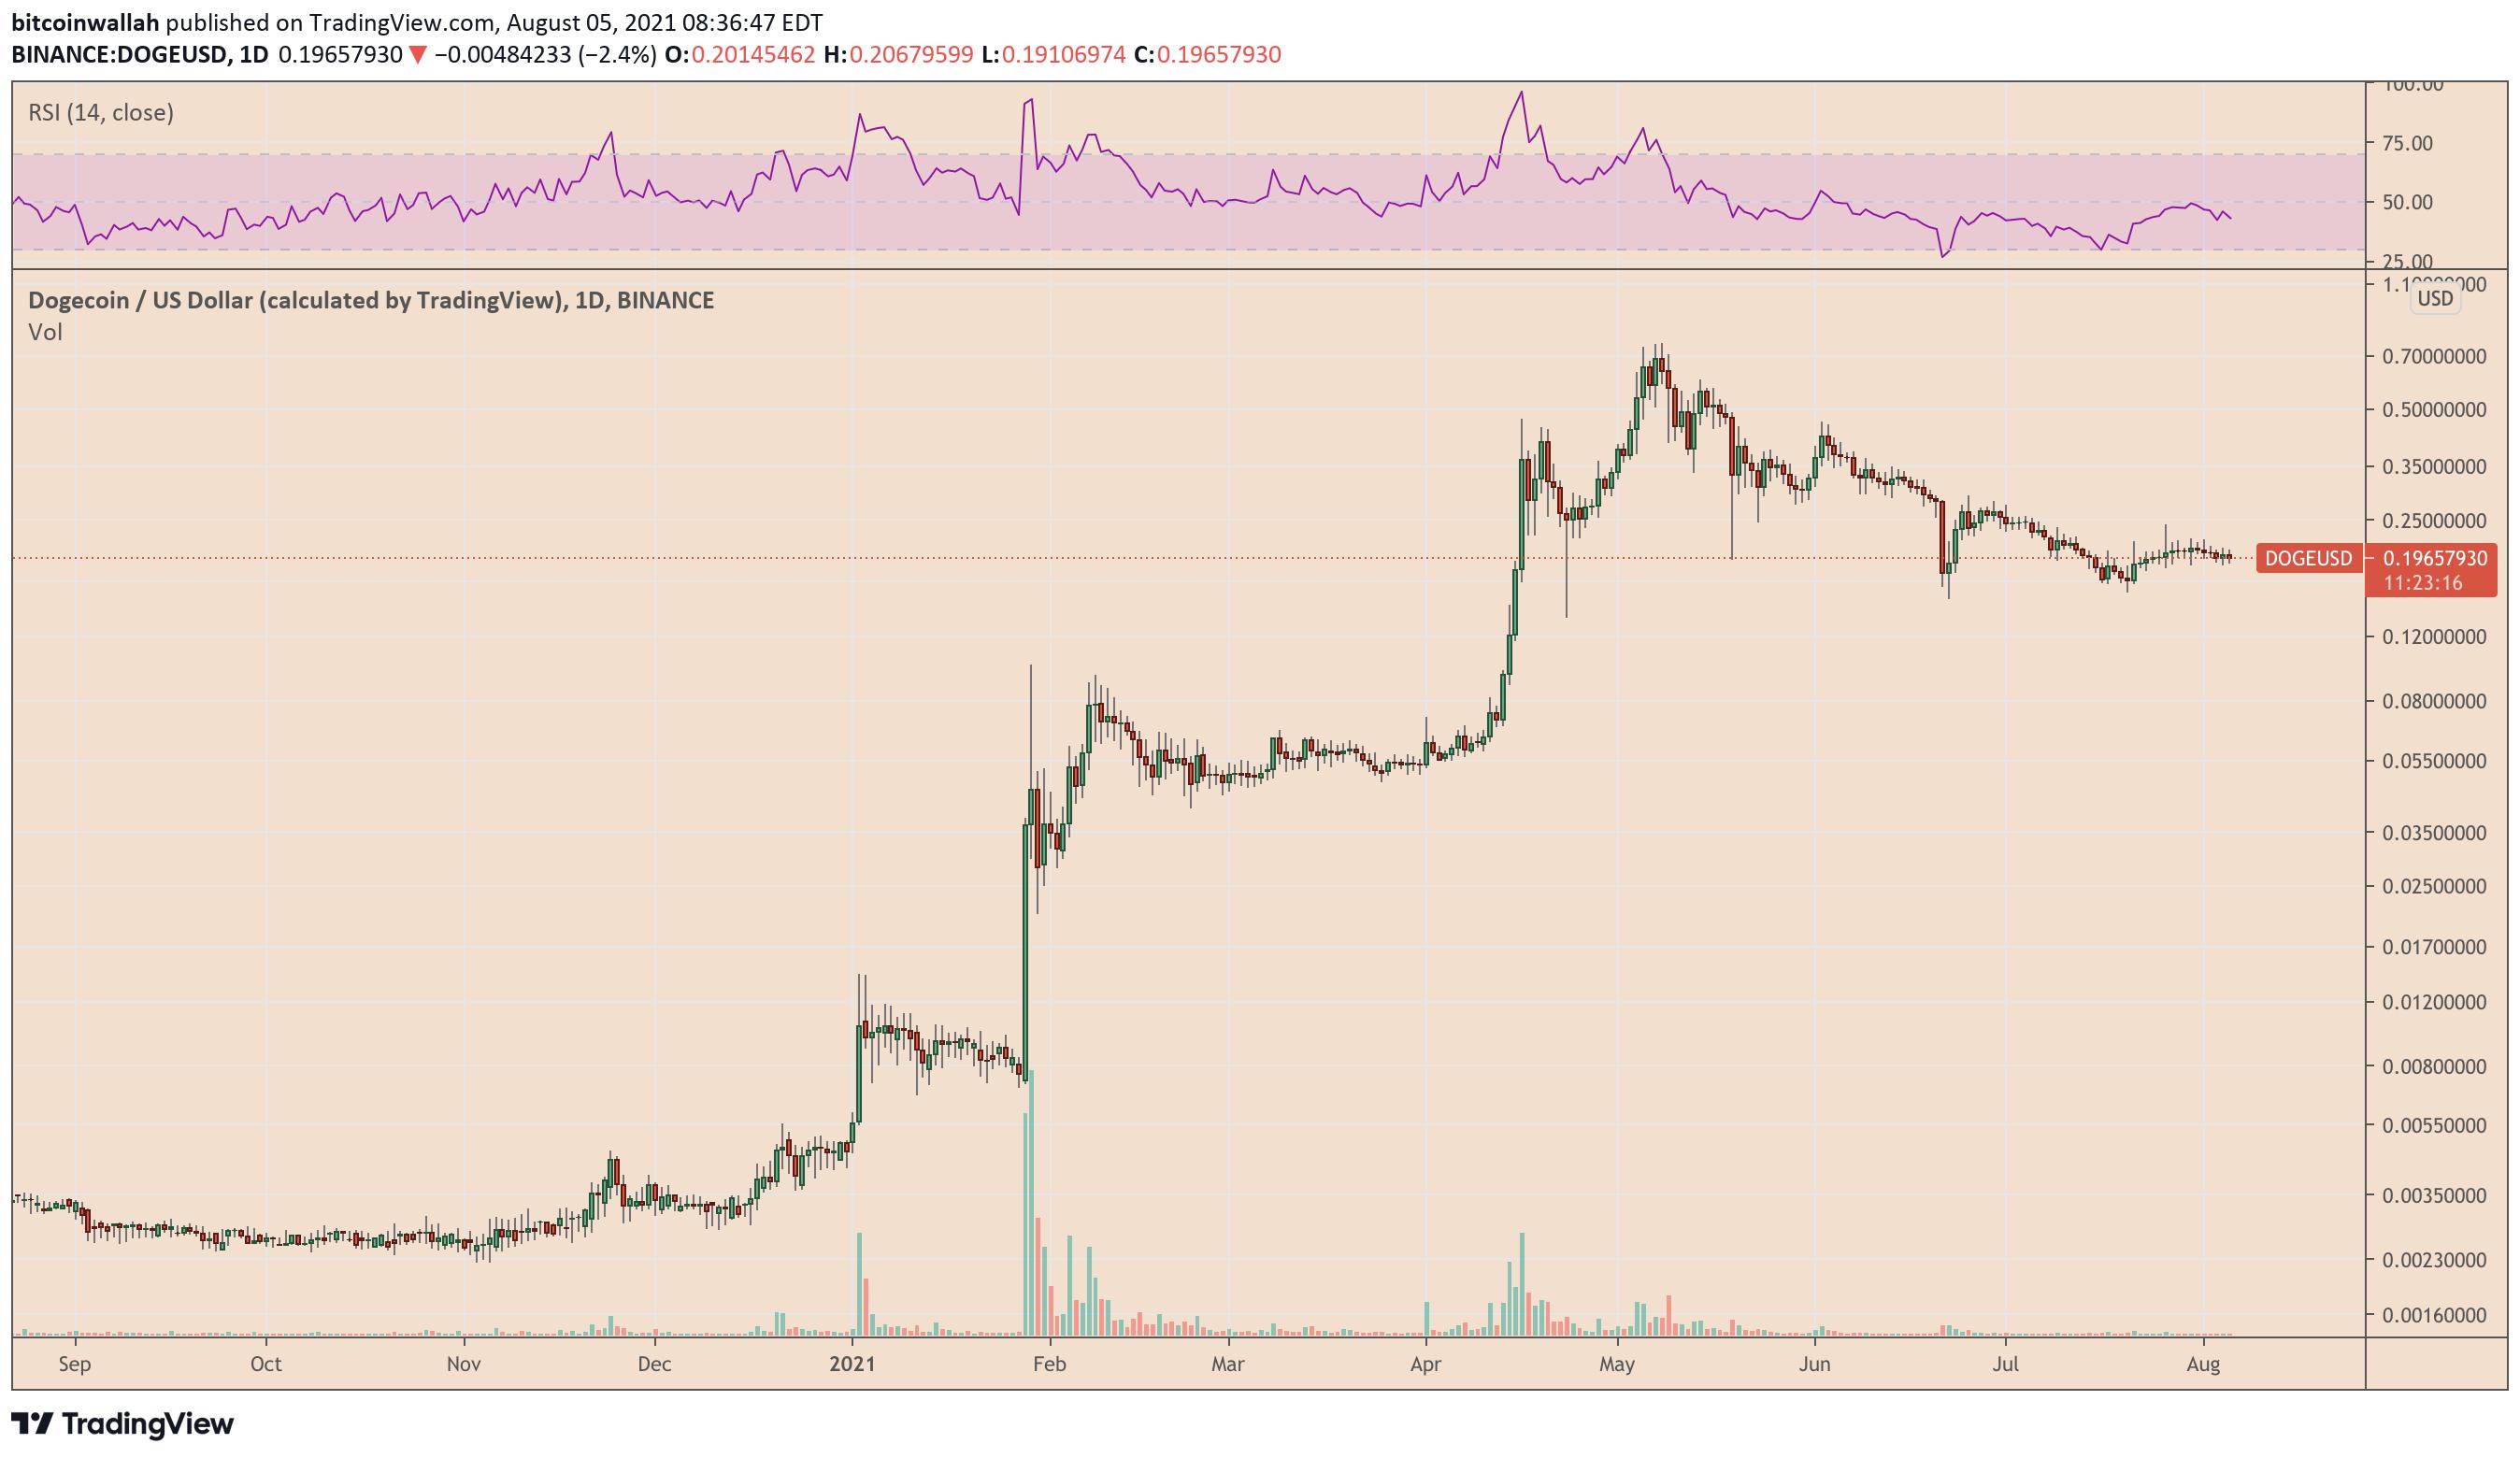 YourCryptoMind 7c6ddd50-a9f0-4e7e-b383-557ffff6bbca Robinhood stock outruns Bitcoin in intraday crash, down over 10% in pre-market